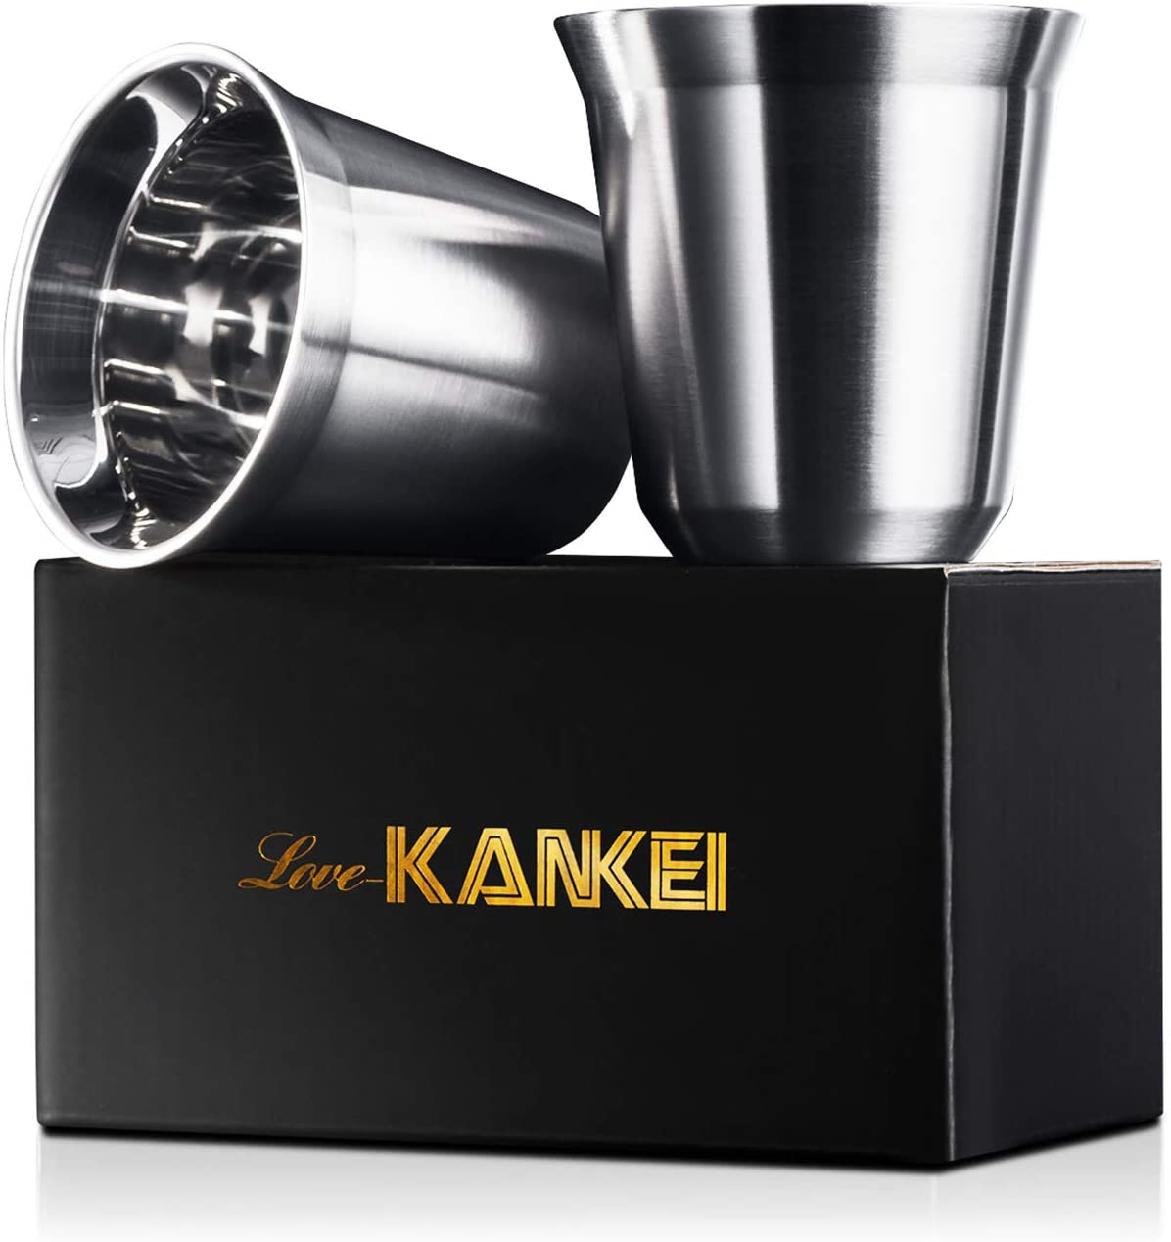 Love-KANKEI エスプレッソカップ ステンレス 2個セットの商品画像